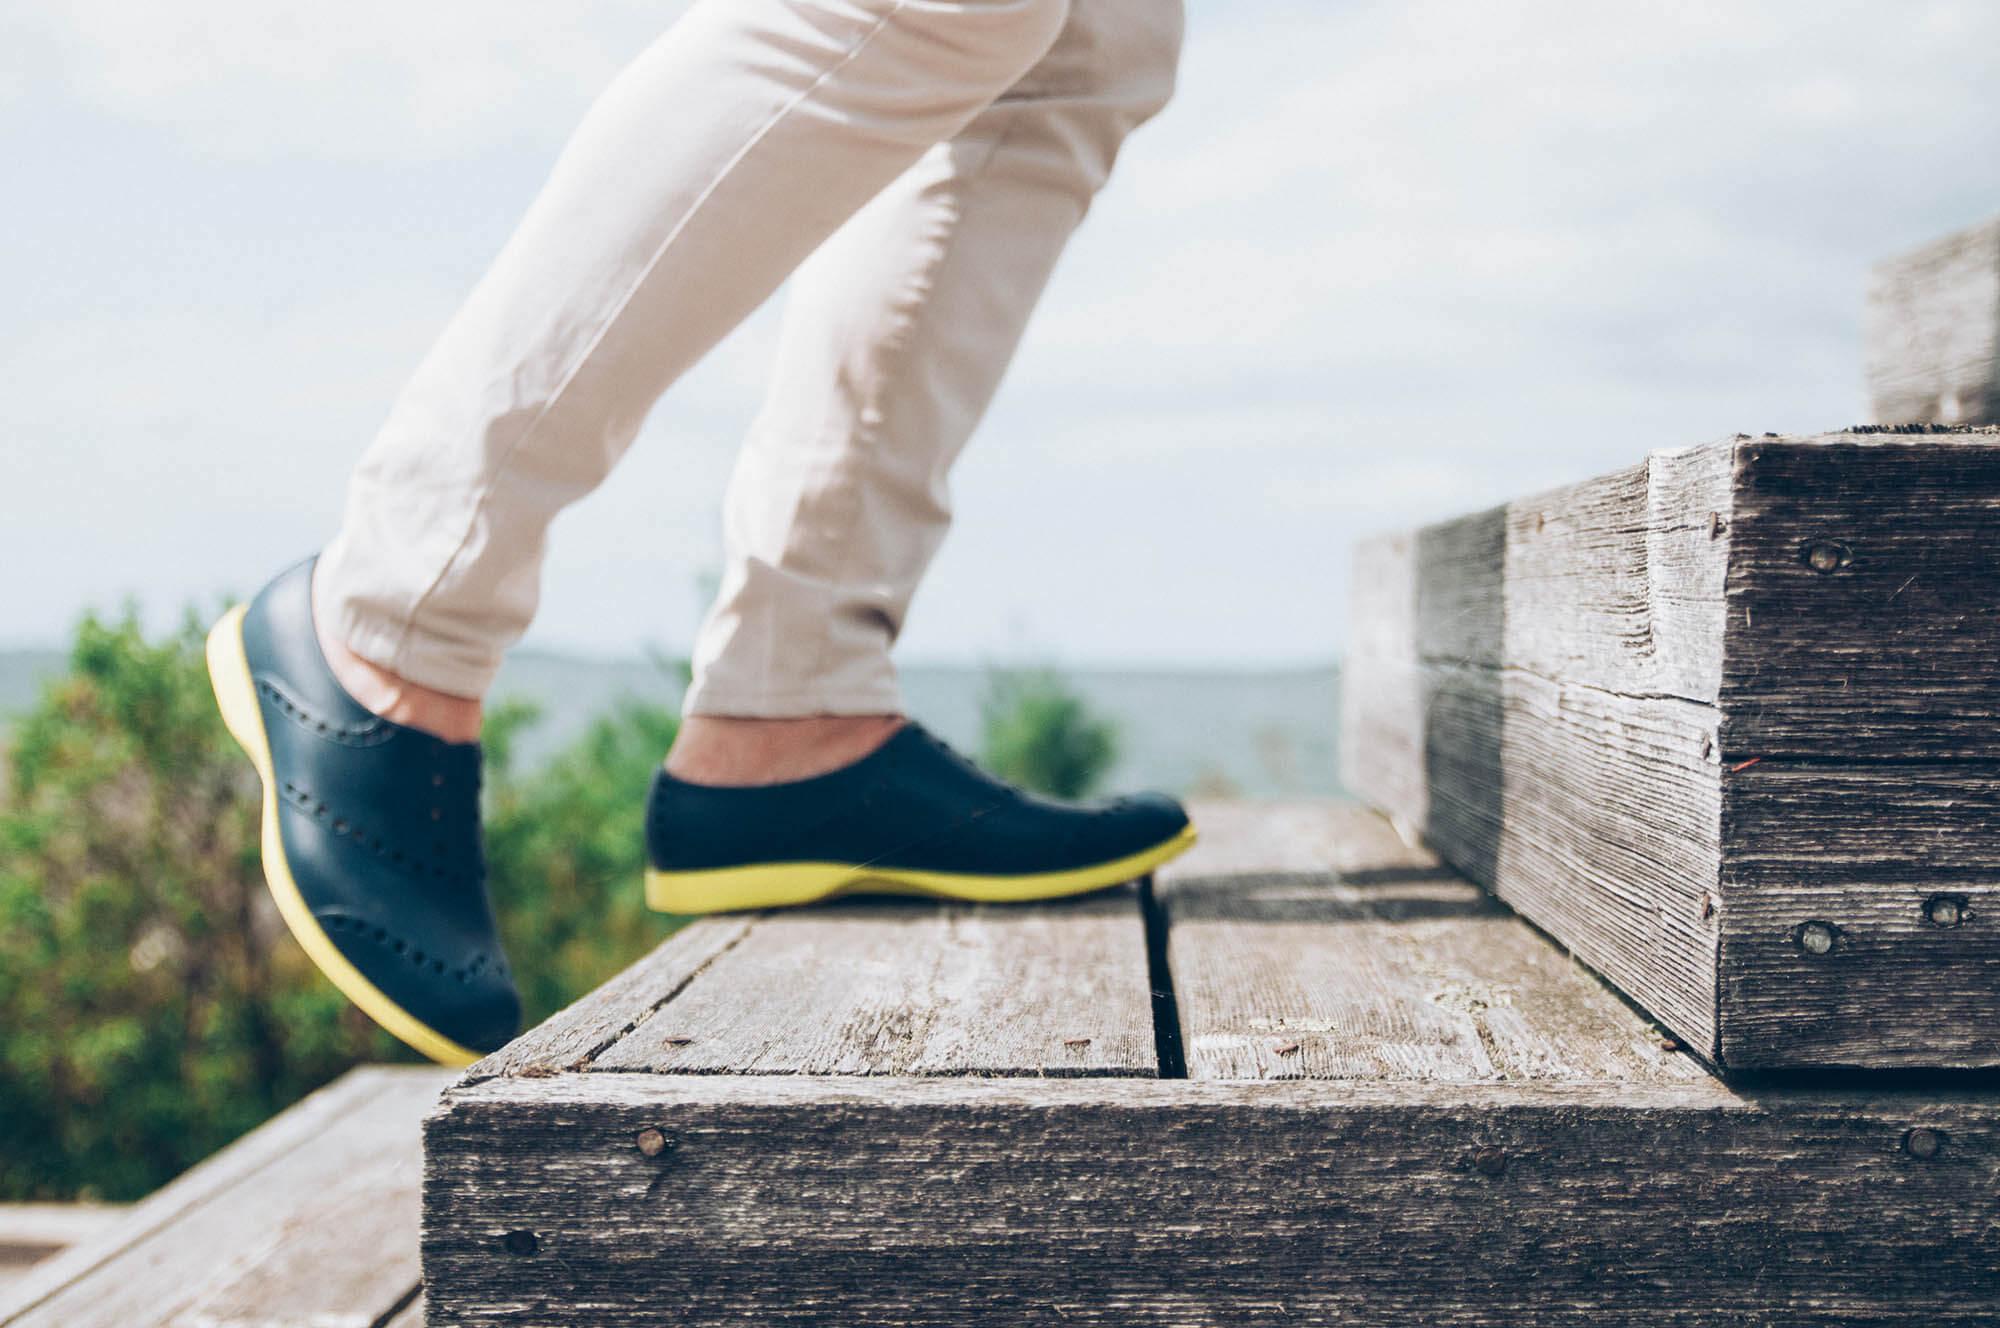 Biion Footwear USA